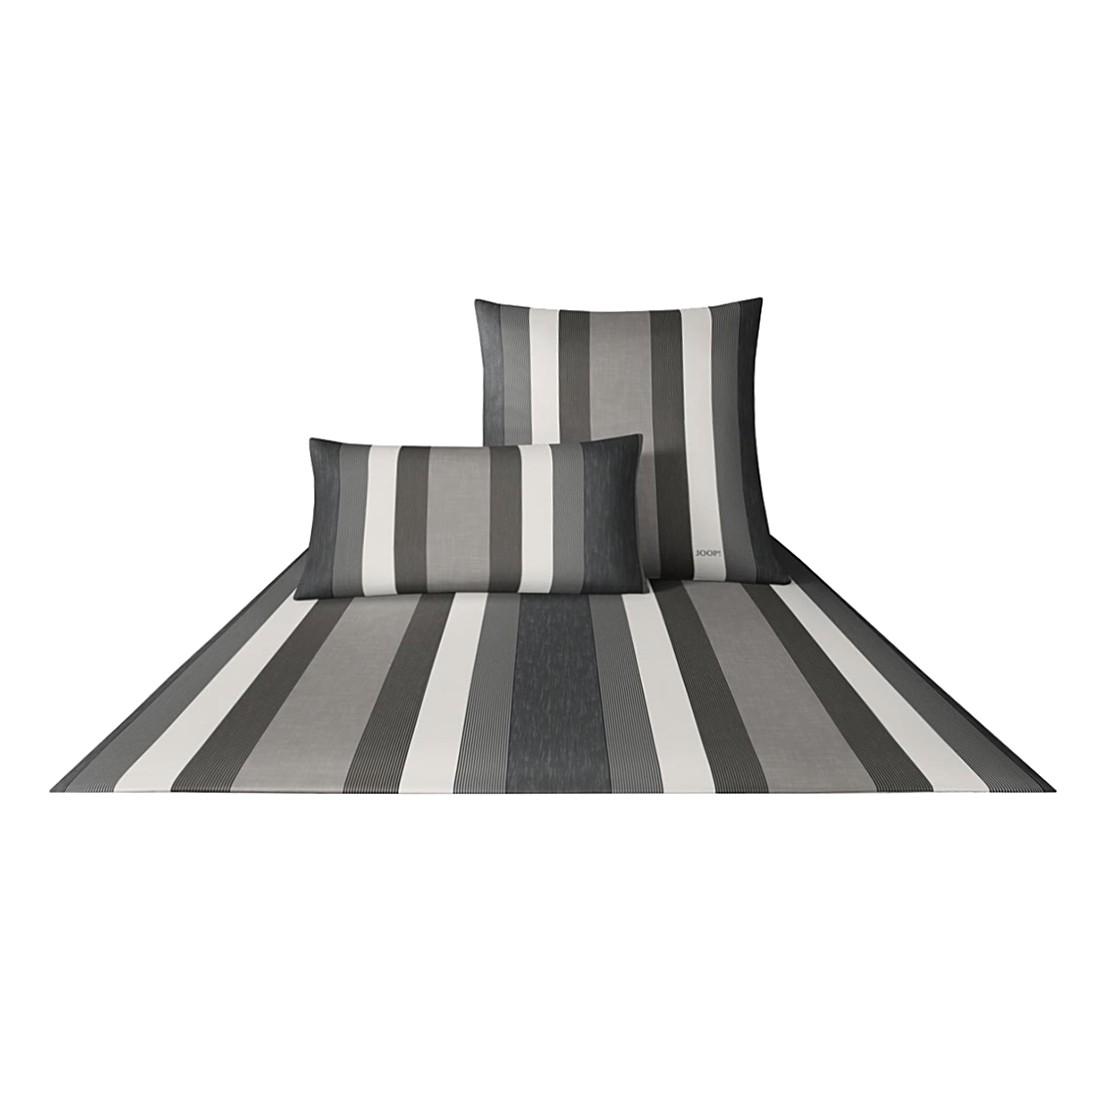 Bettwäsche Rapid Stripes Kiesel 4043-9 – 100% Baumwolle – Mehrfarbig – 135 x 200 cm, Joop online bestellen